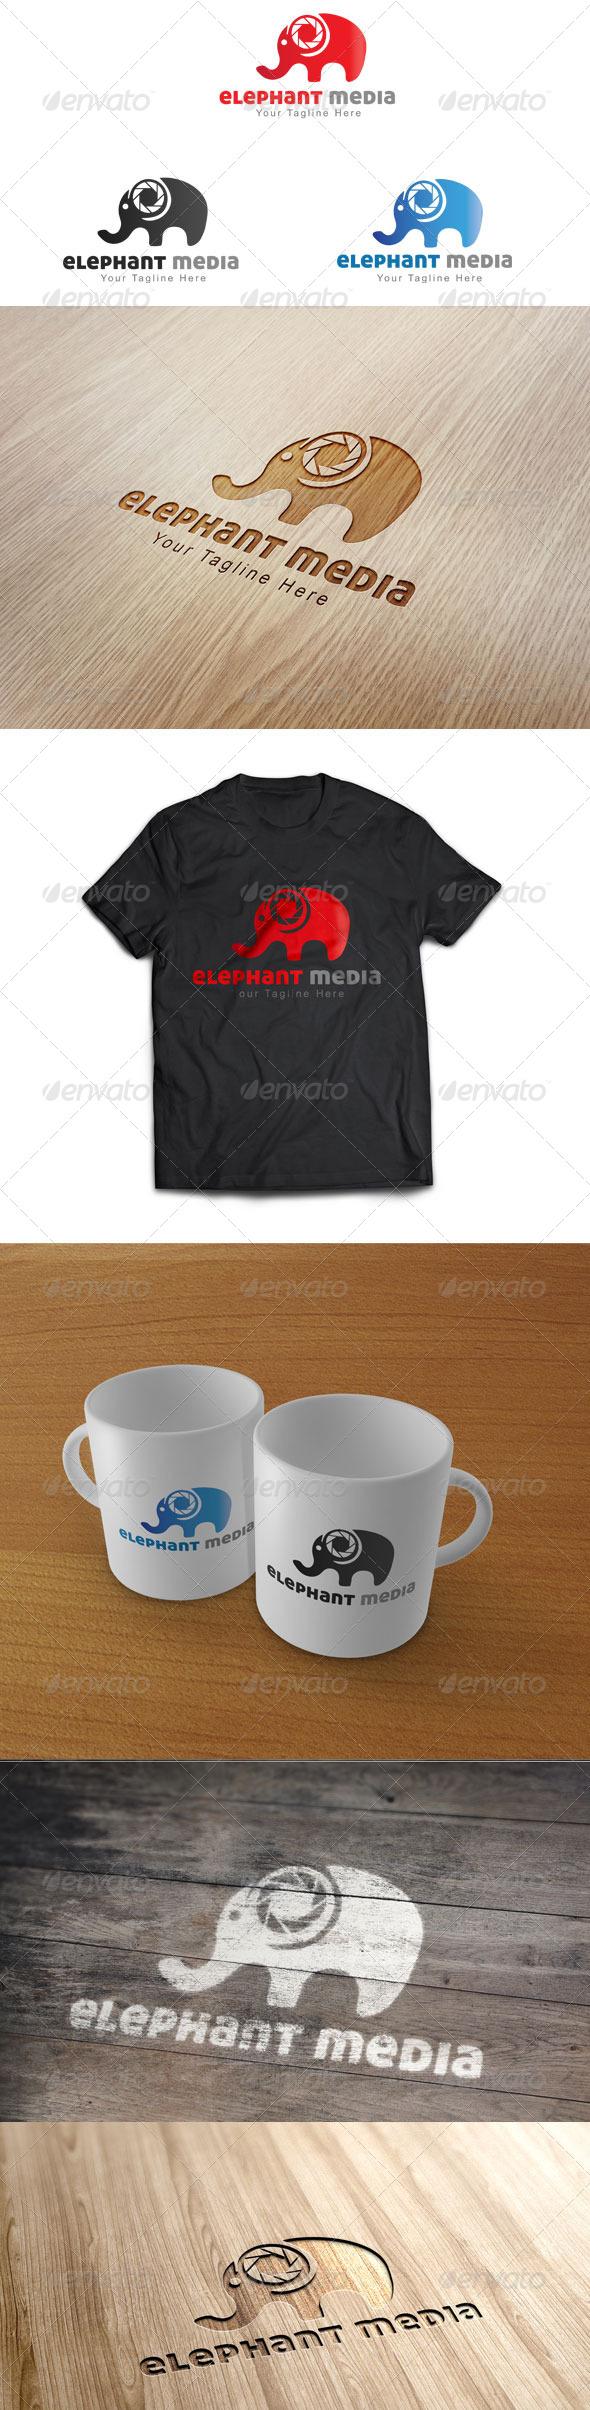 Elephant Media - Logo Template - Animals Logo Templates